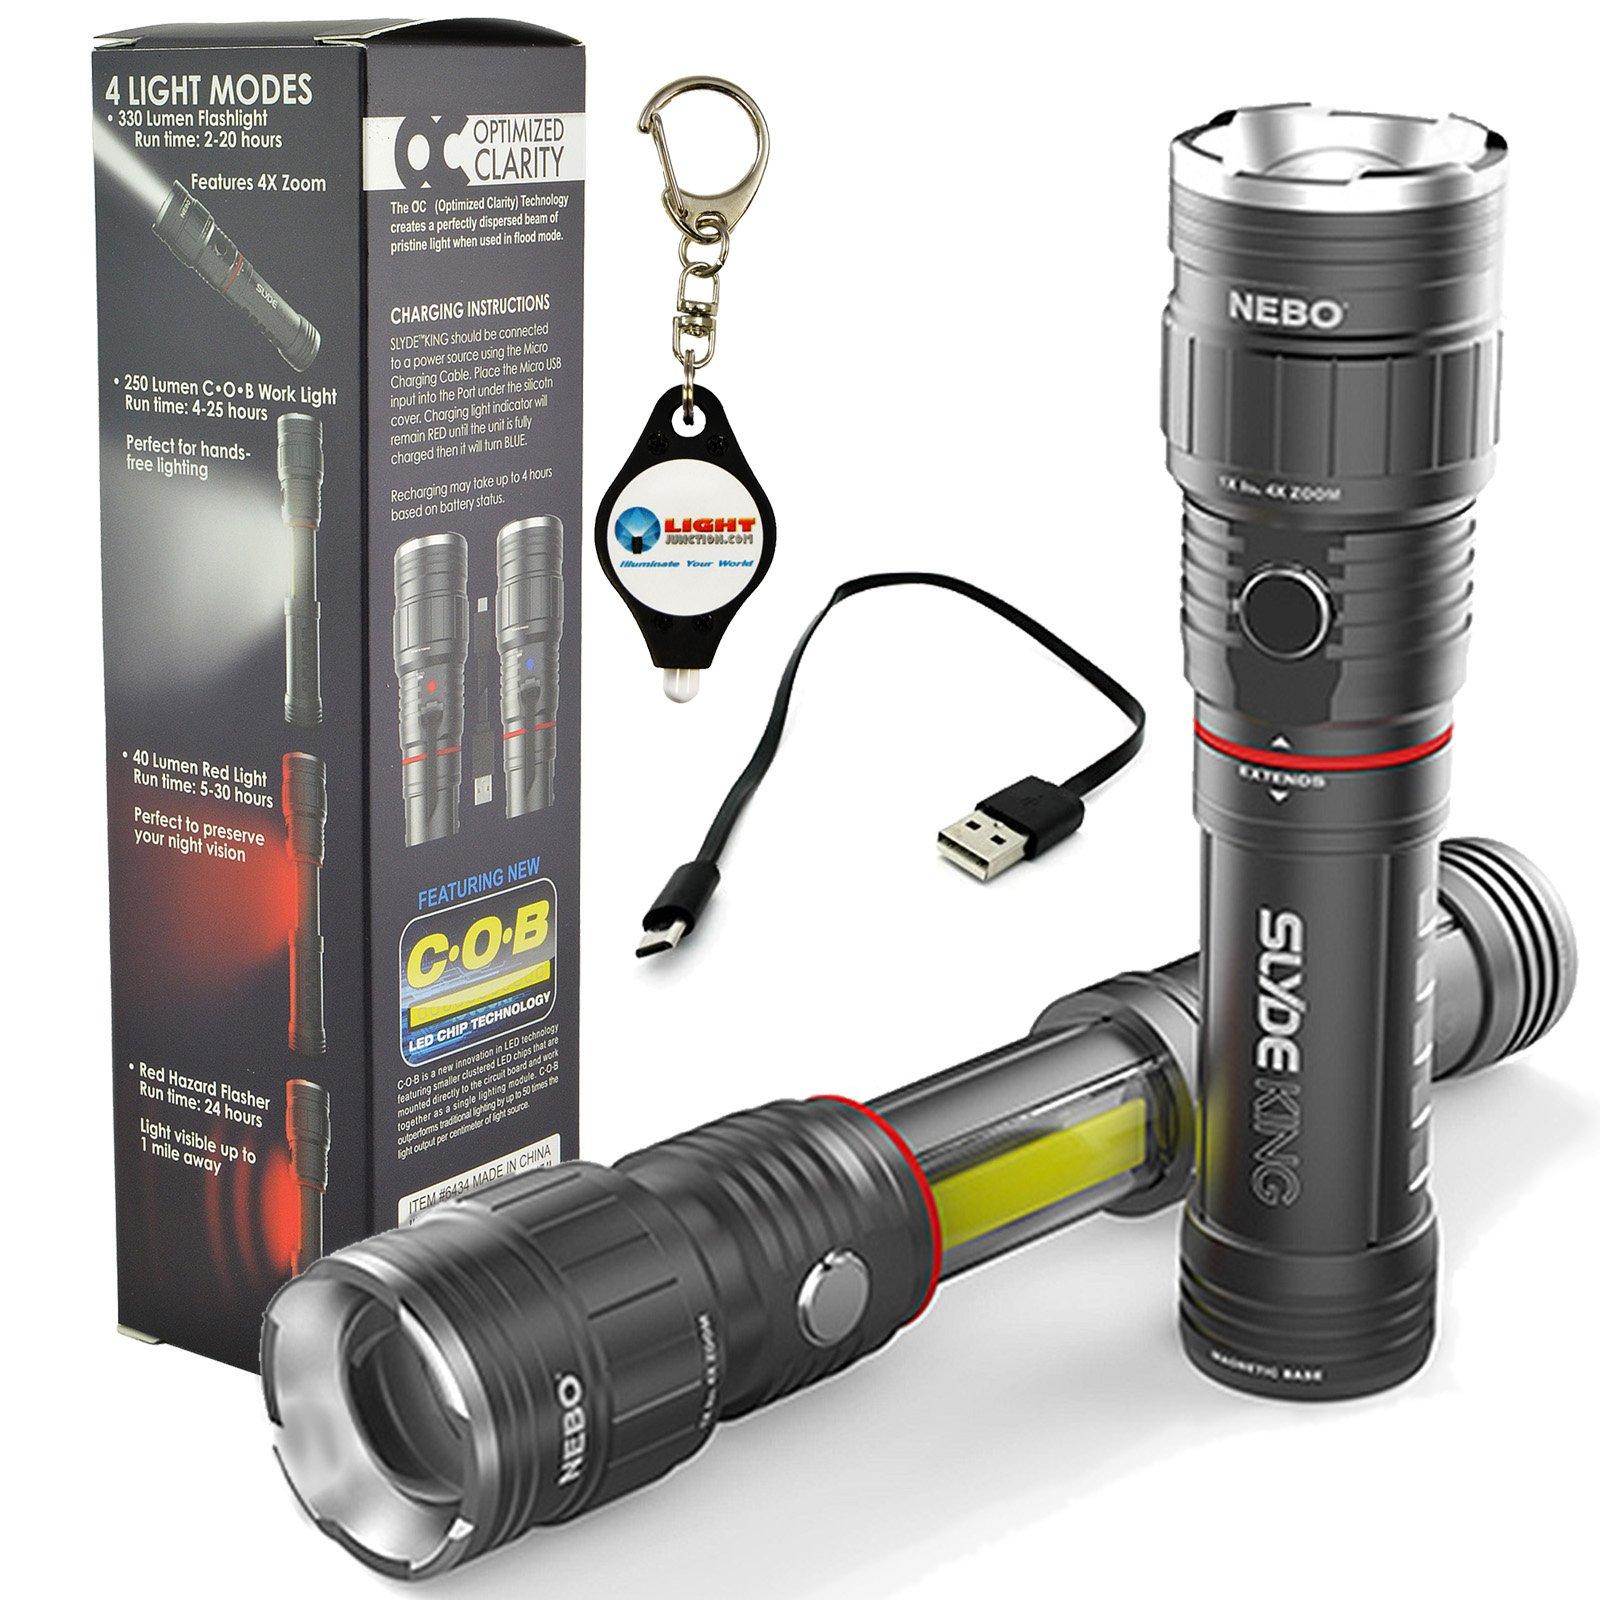 Nebo Slyde King 6434 Rechargeable LED Flashlight Work Light Adjustable Zoom with LightJunction Keychain Light